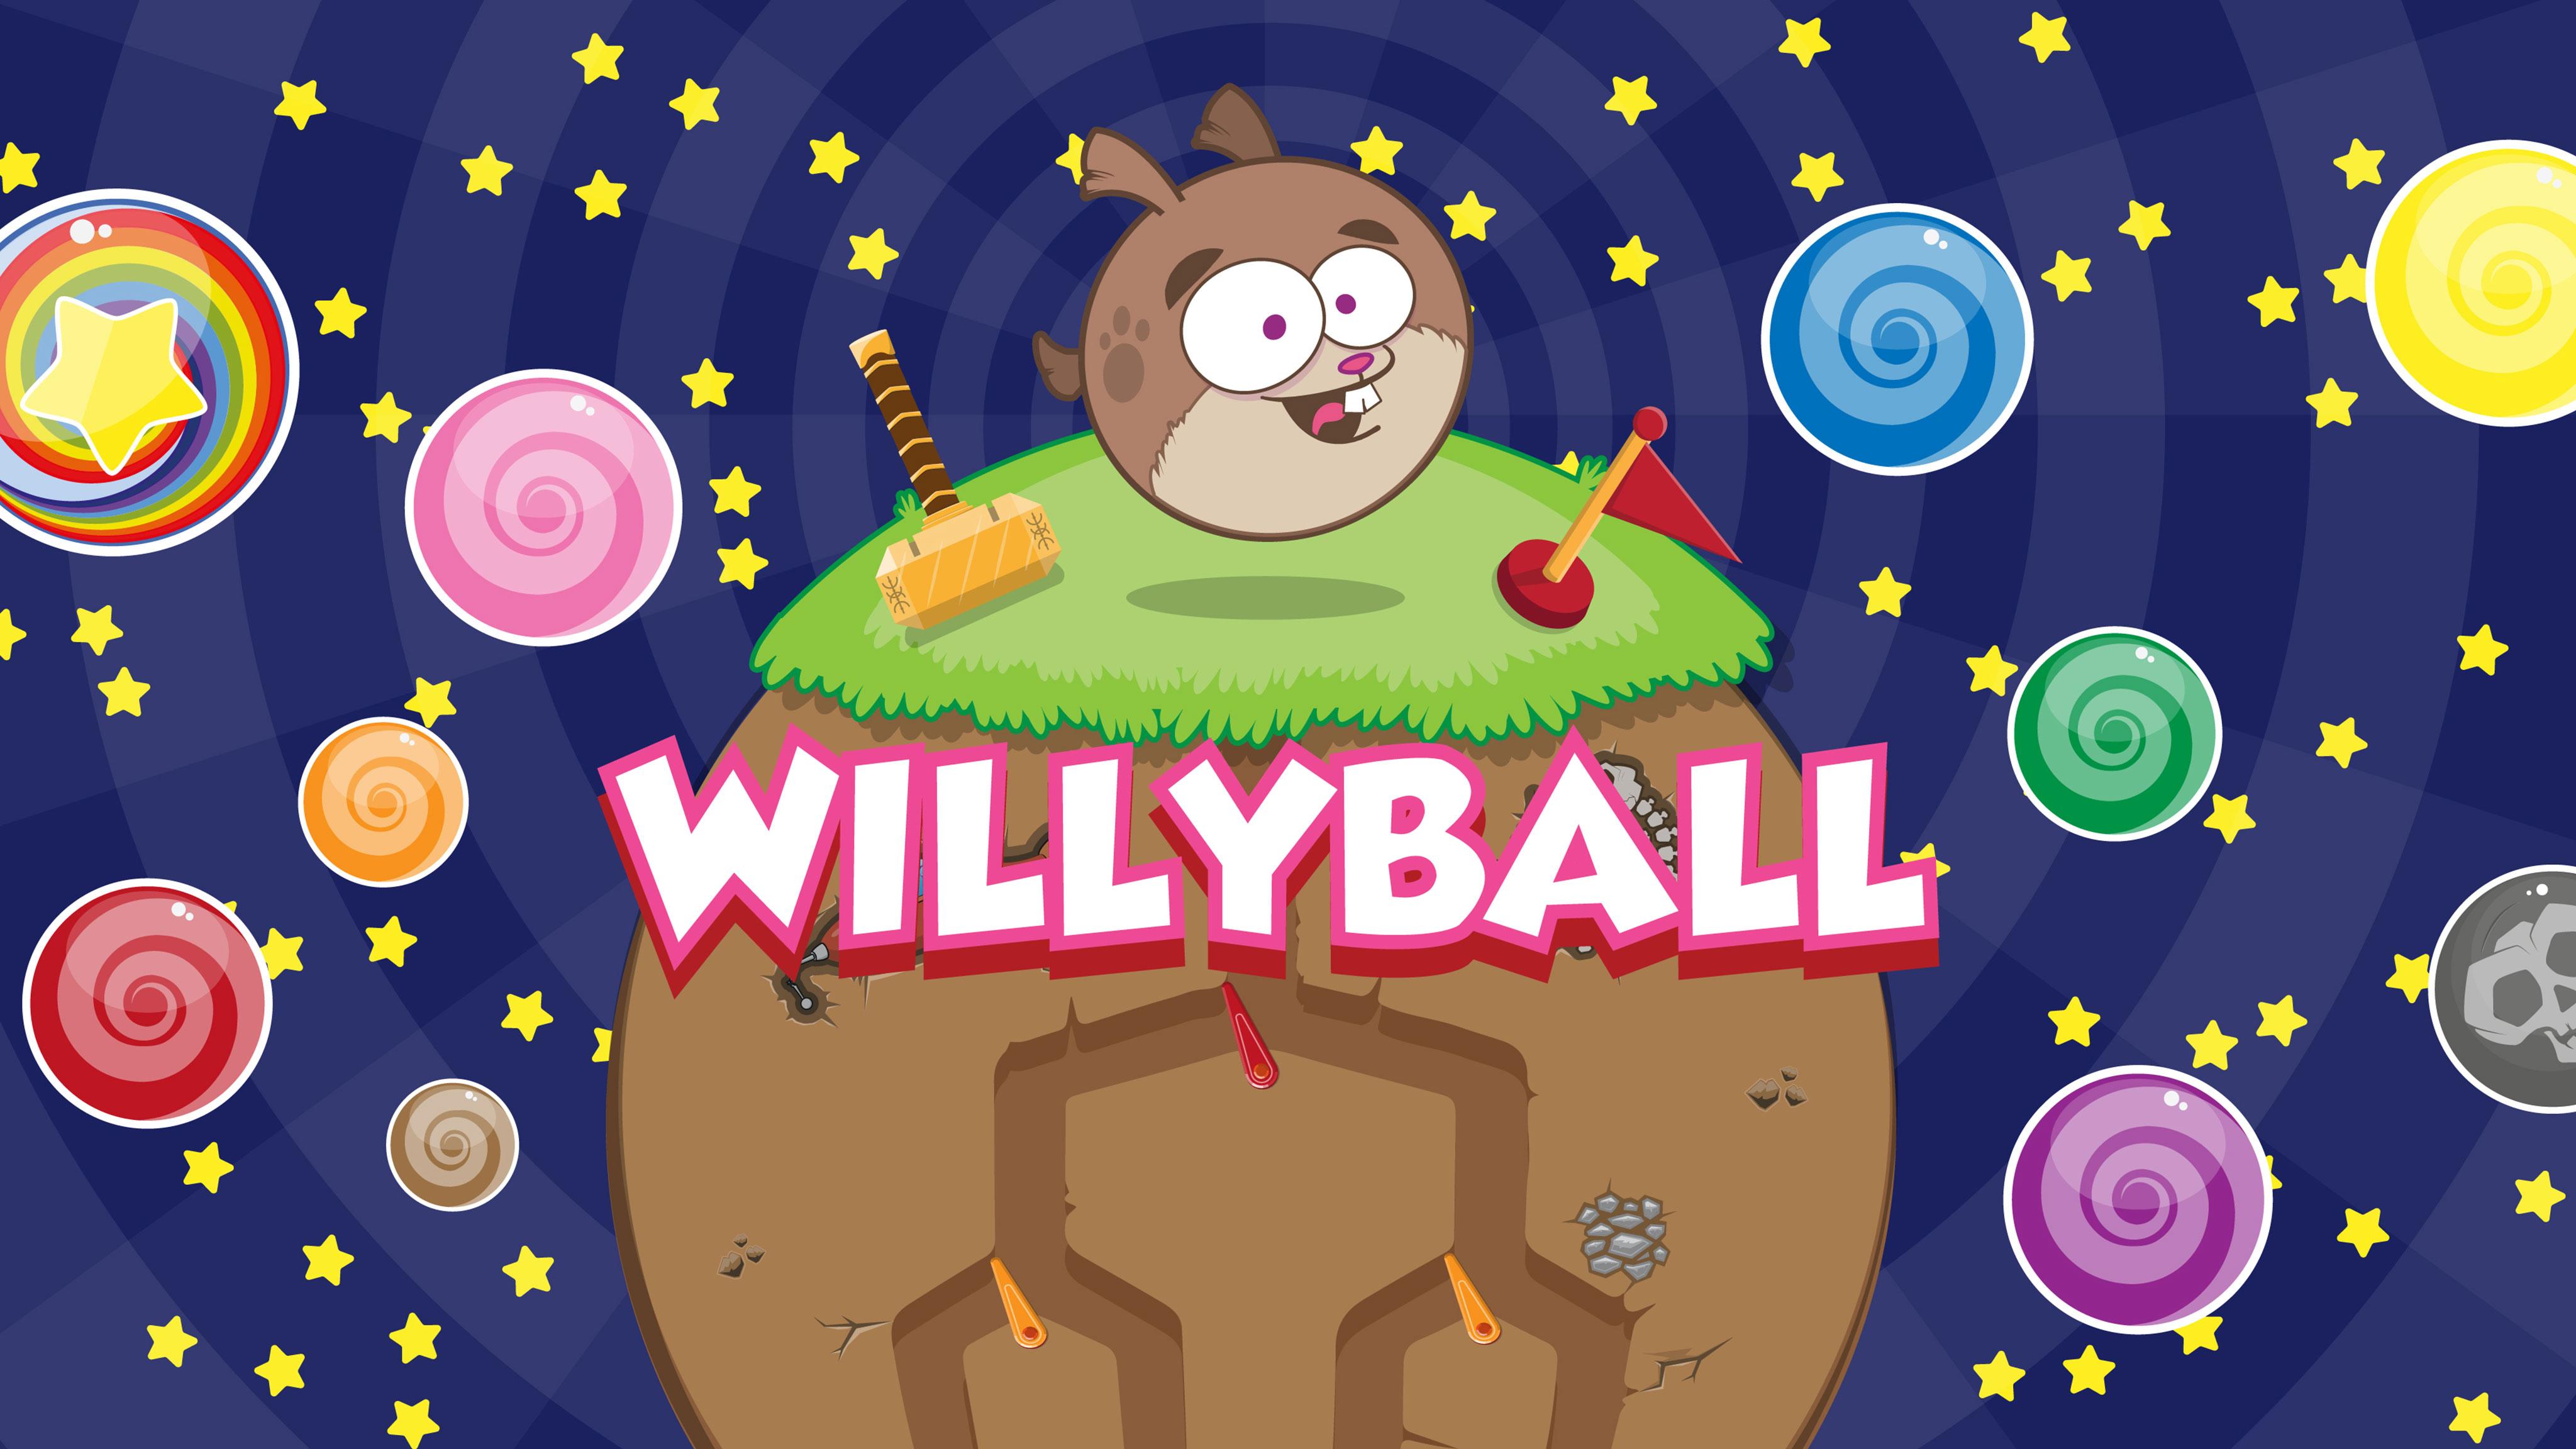 WillyBall